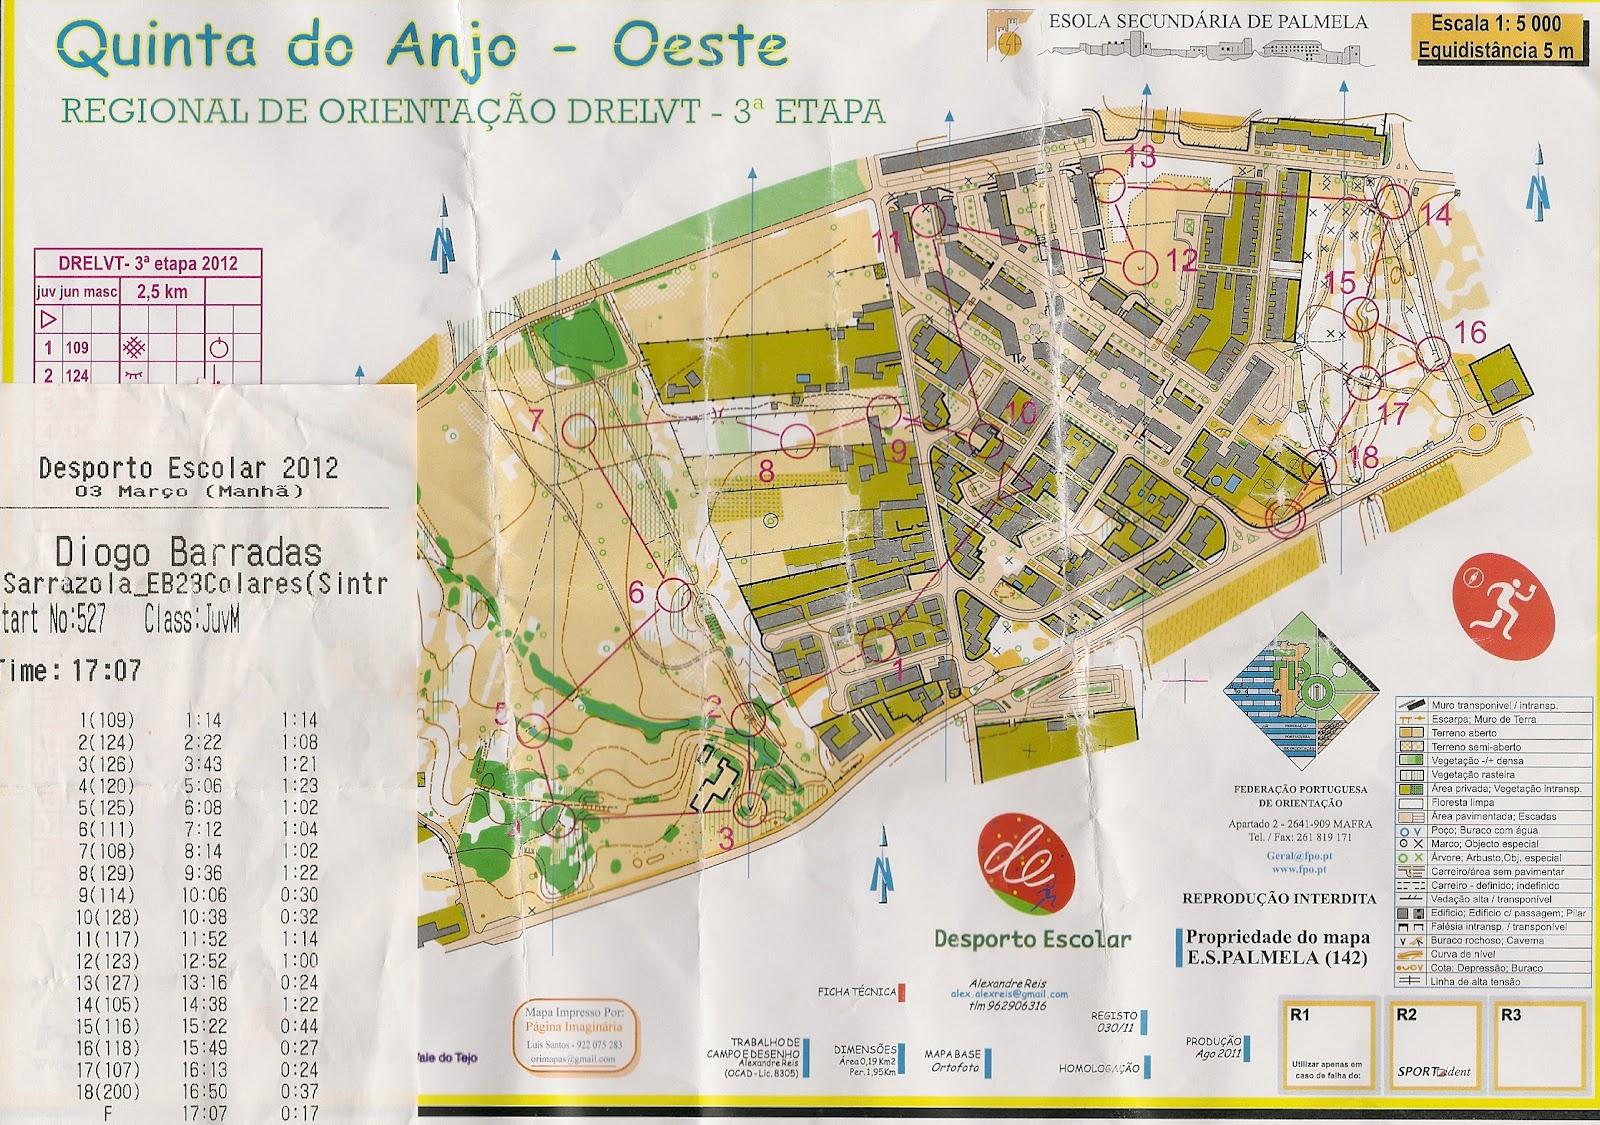 alcoitão mapa Orienta Bonito: It's my life ! Orienteering alcoitão mapa